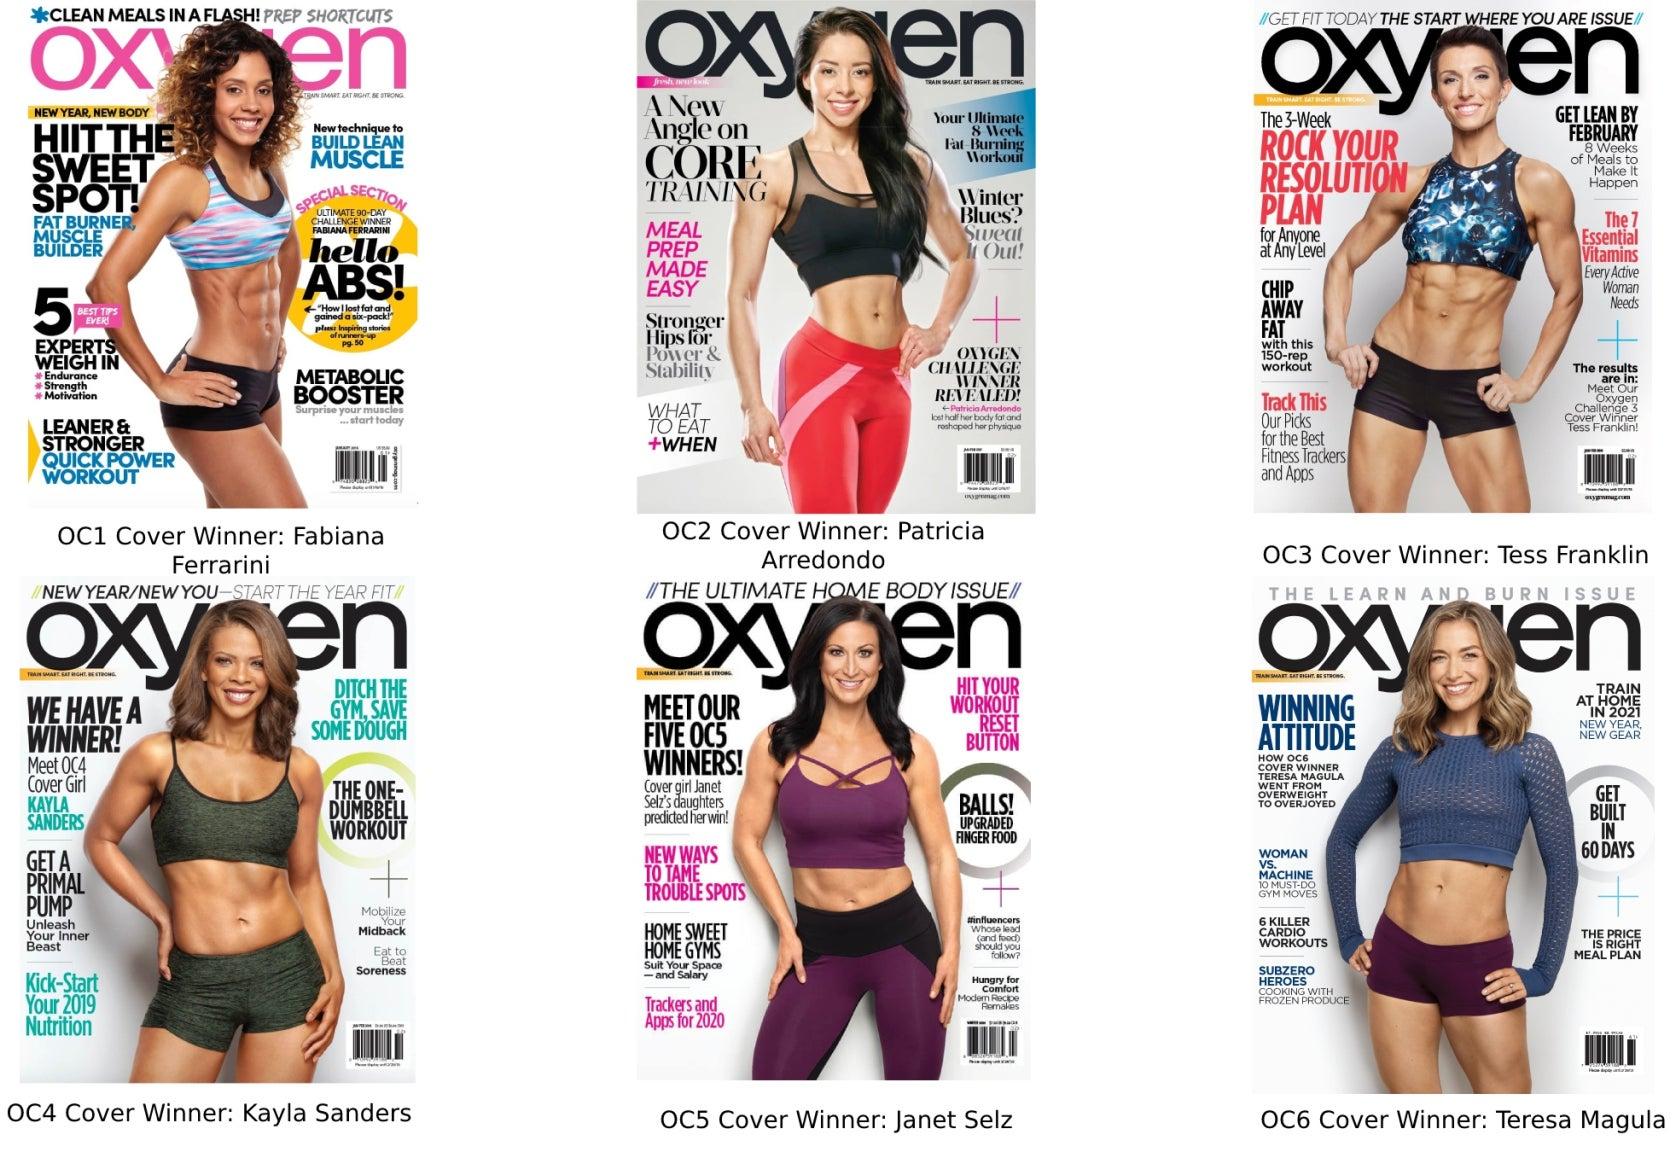 Oxygen Challenge Winners